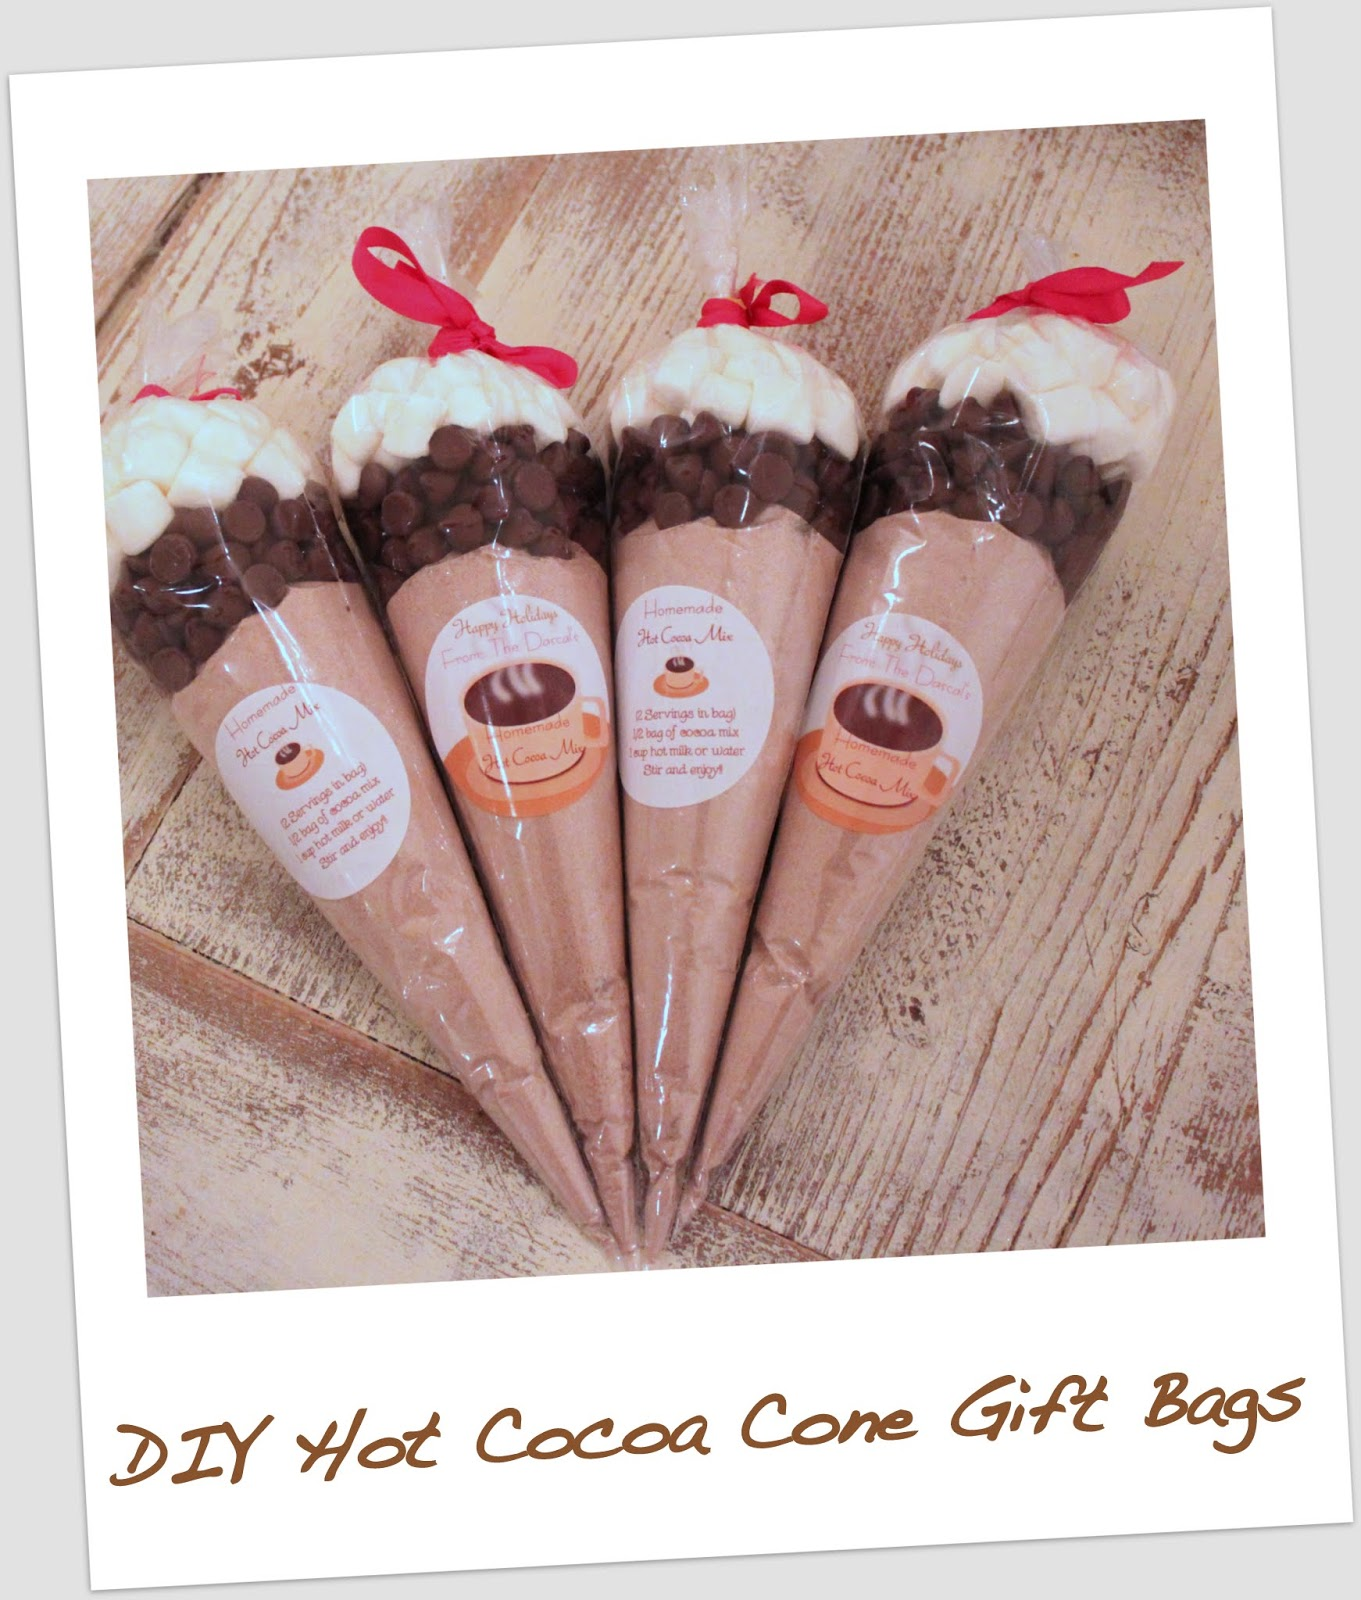 Hot Chocolate Christmas Gifts